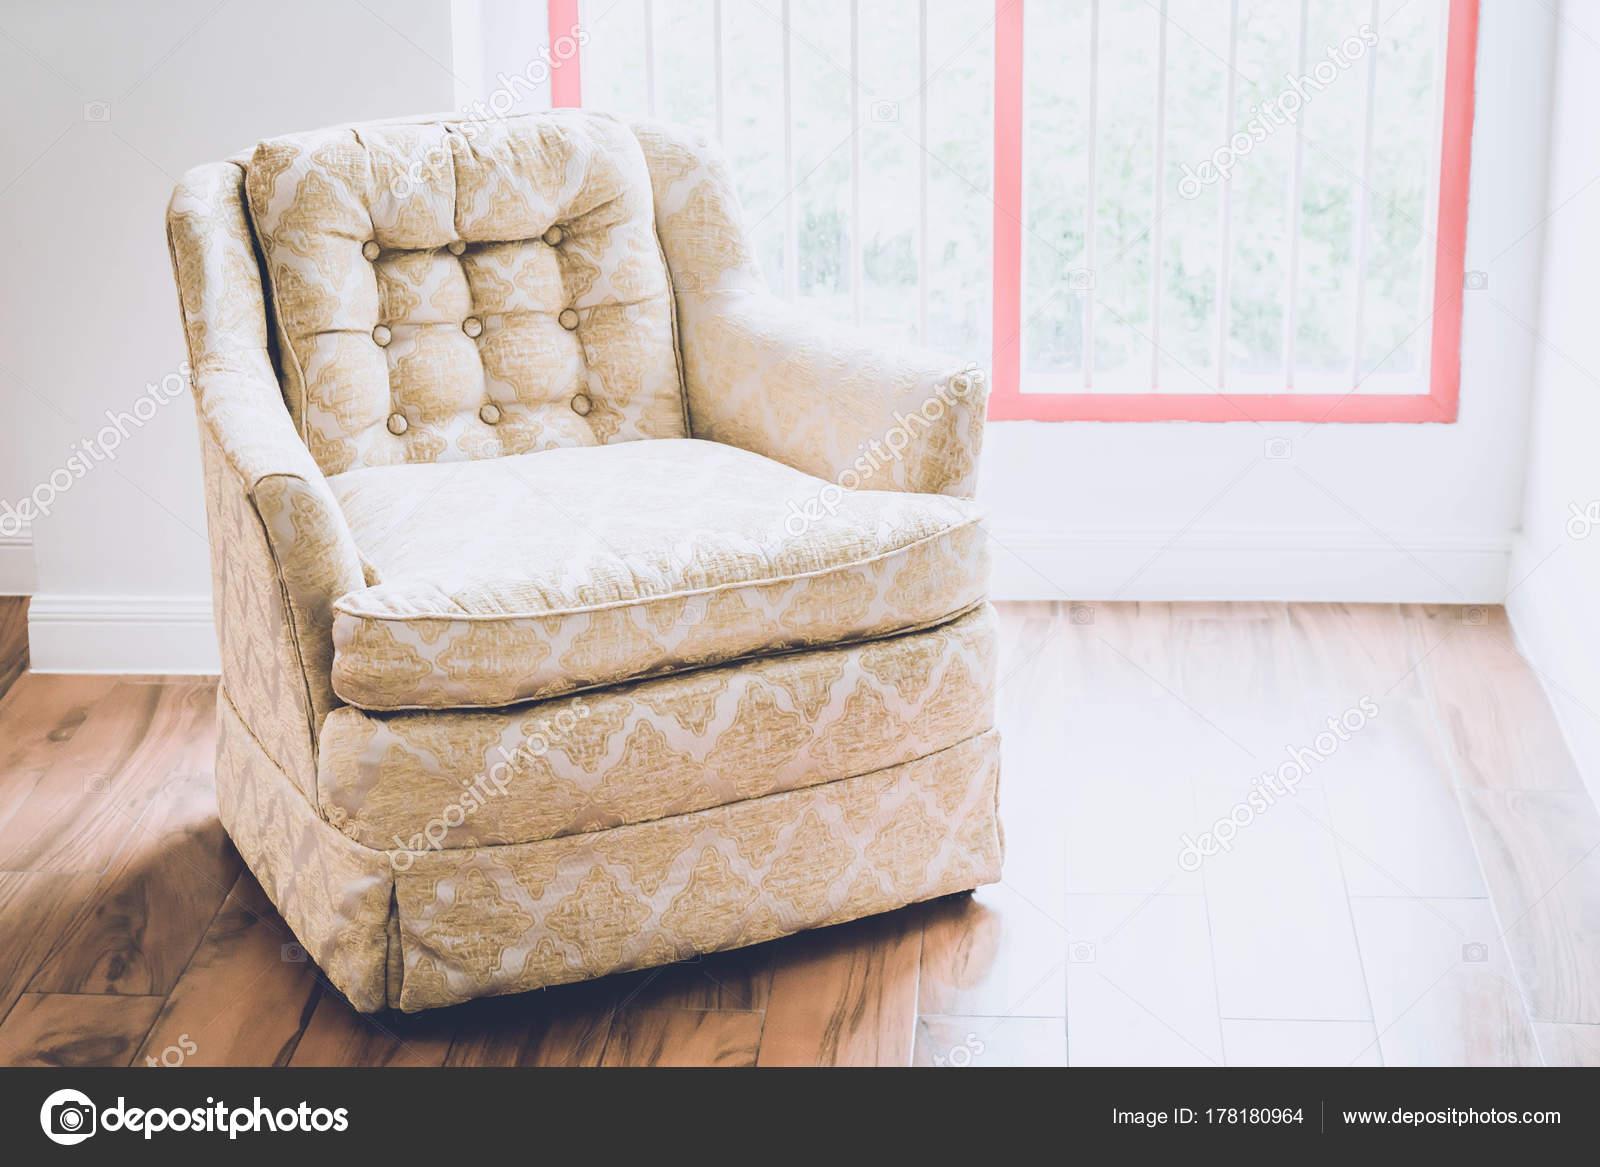 Oude fauteuil decoratie in huis u2014 stockfoto © topntp #178180964